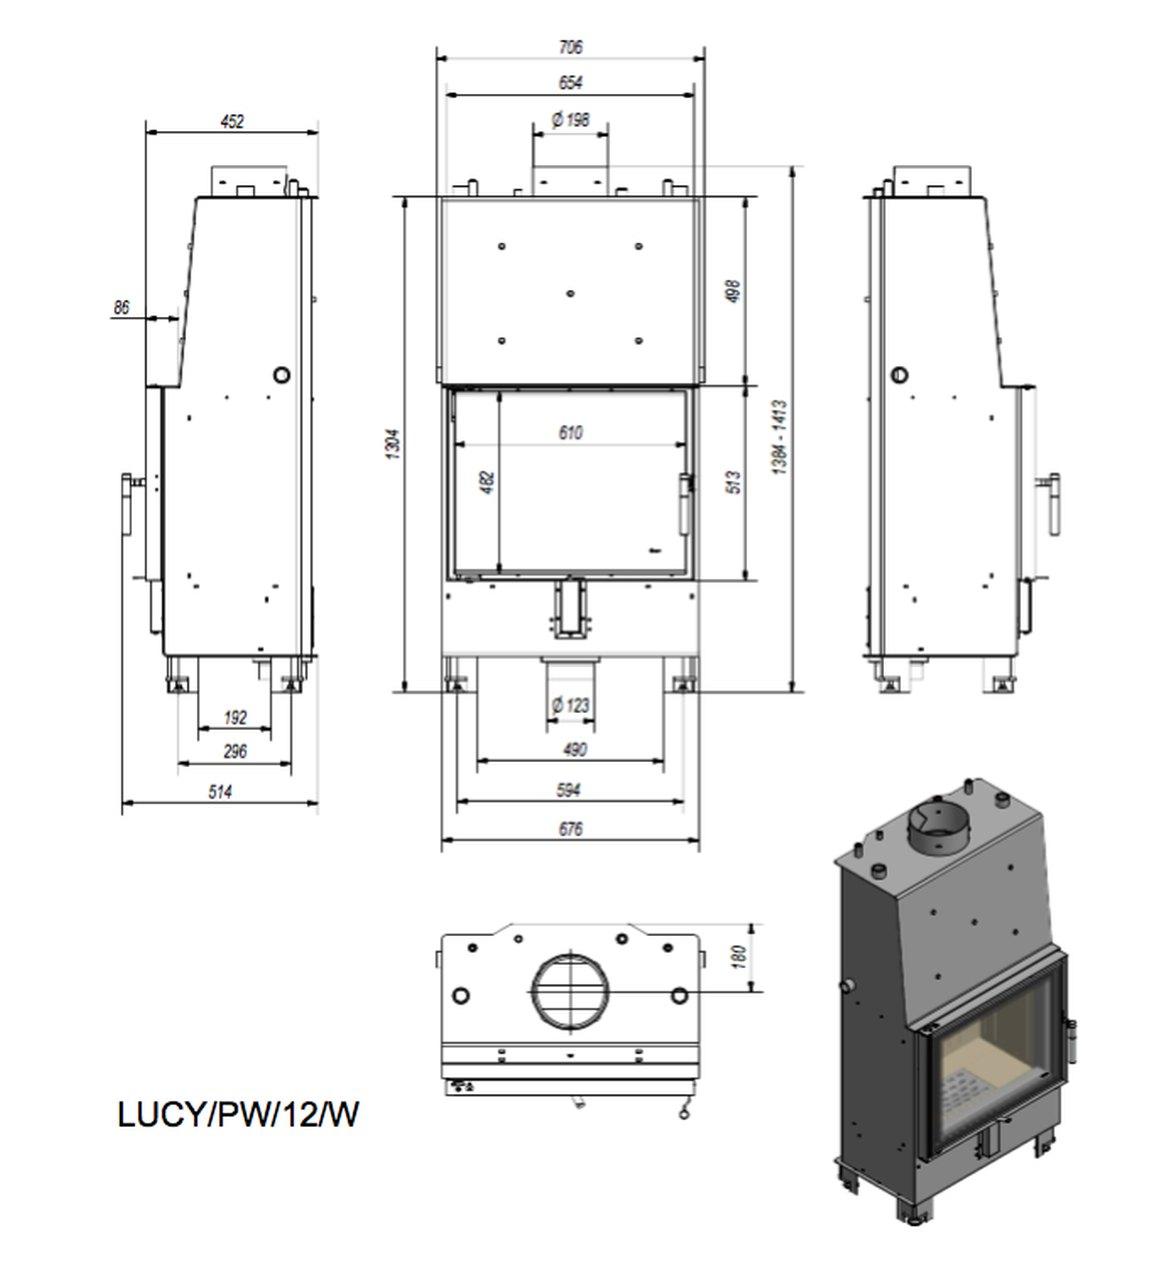 0 0 productGfx f7fc00b1df58a7358e976cf56f7dba2e - Water fireplace insert LUCY PW 12